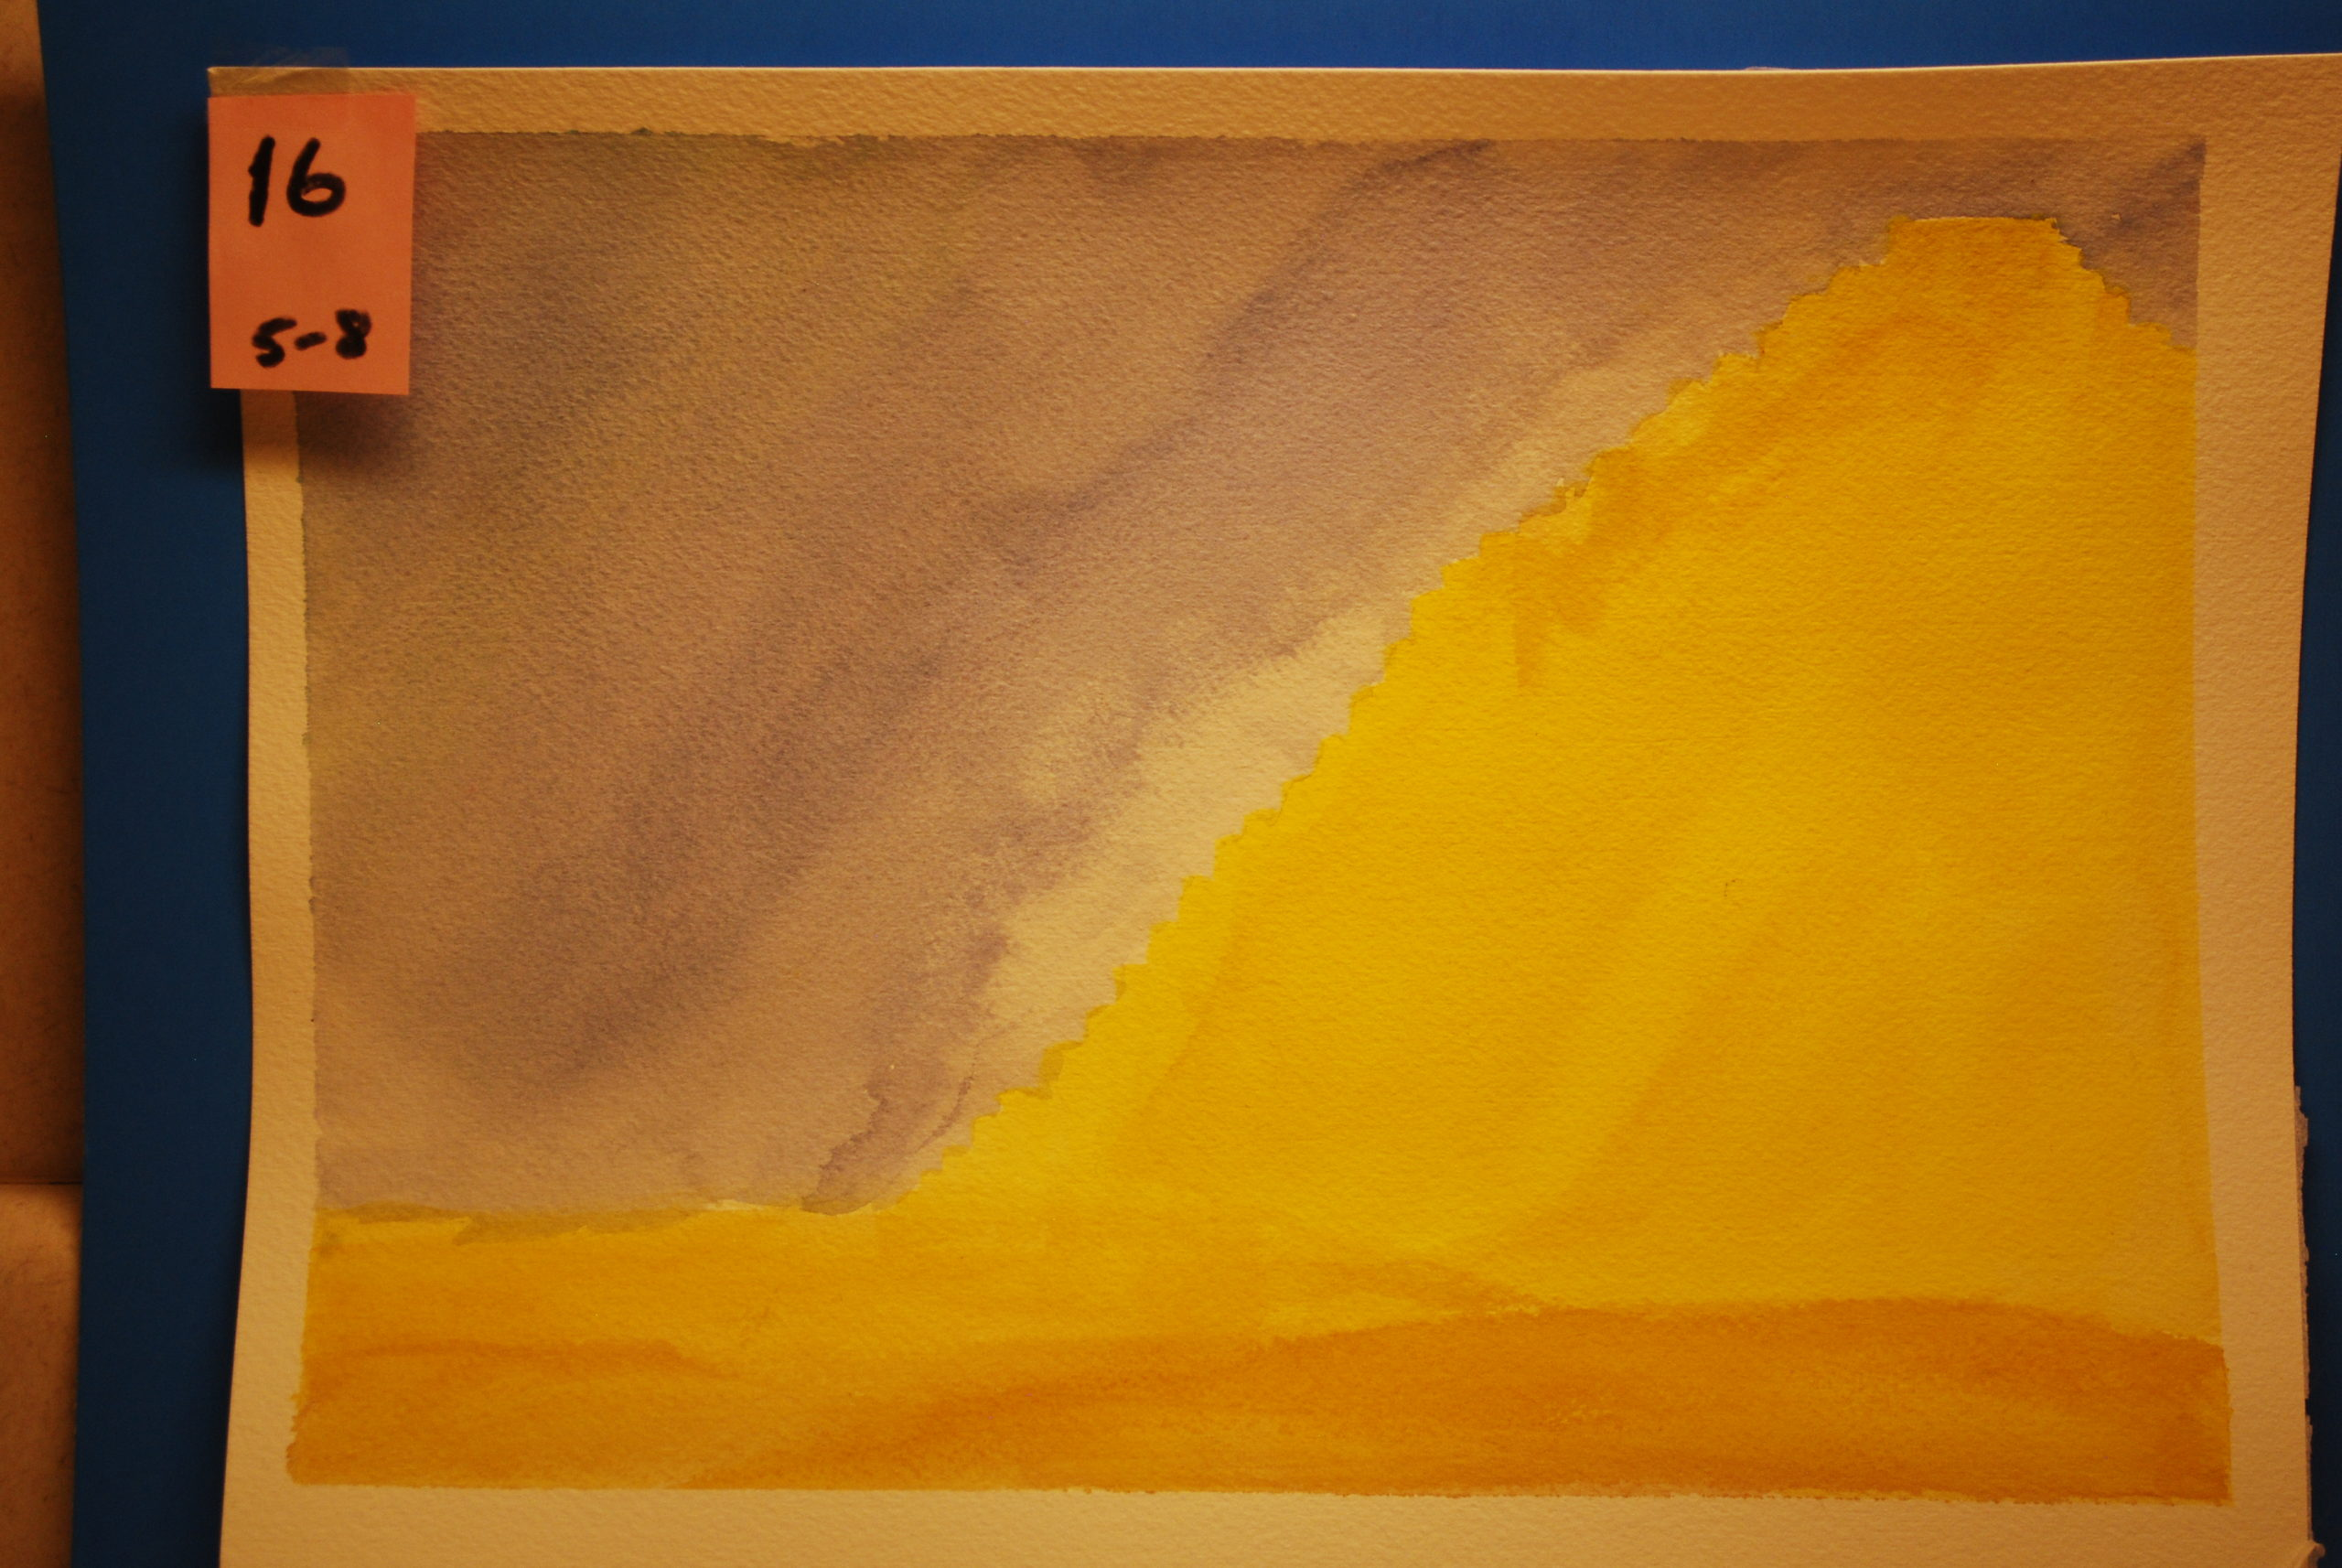 YAC 2020 #16 5-8 Yellow Pyramid b